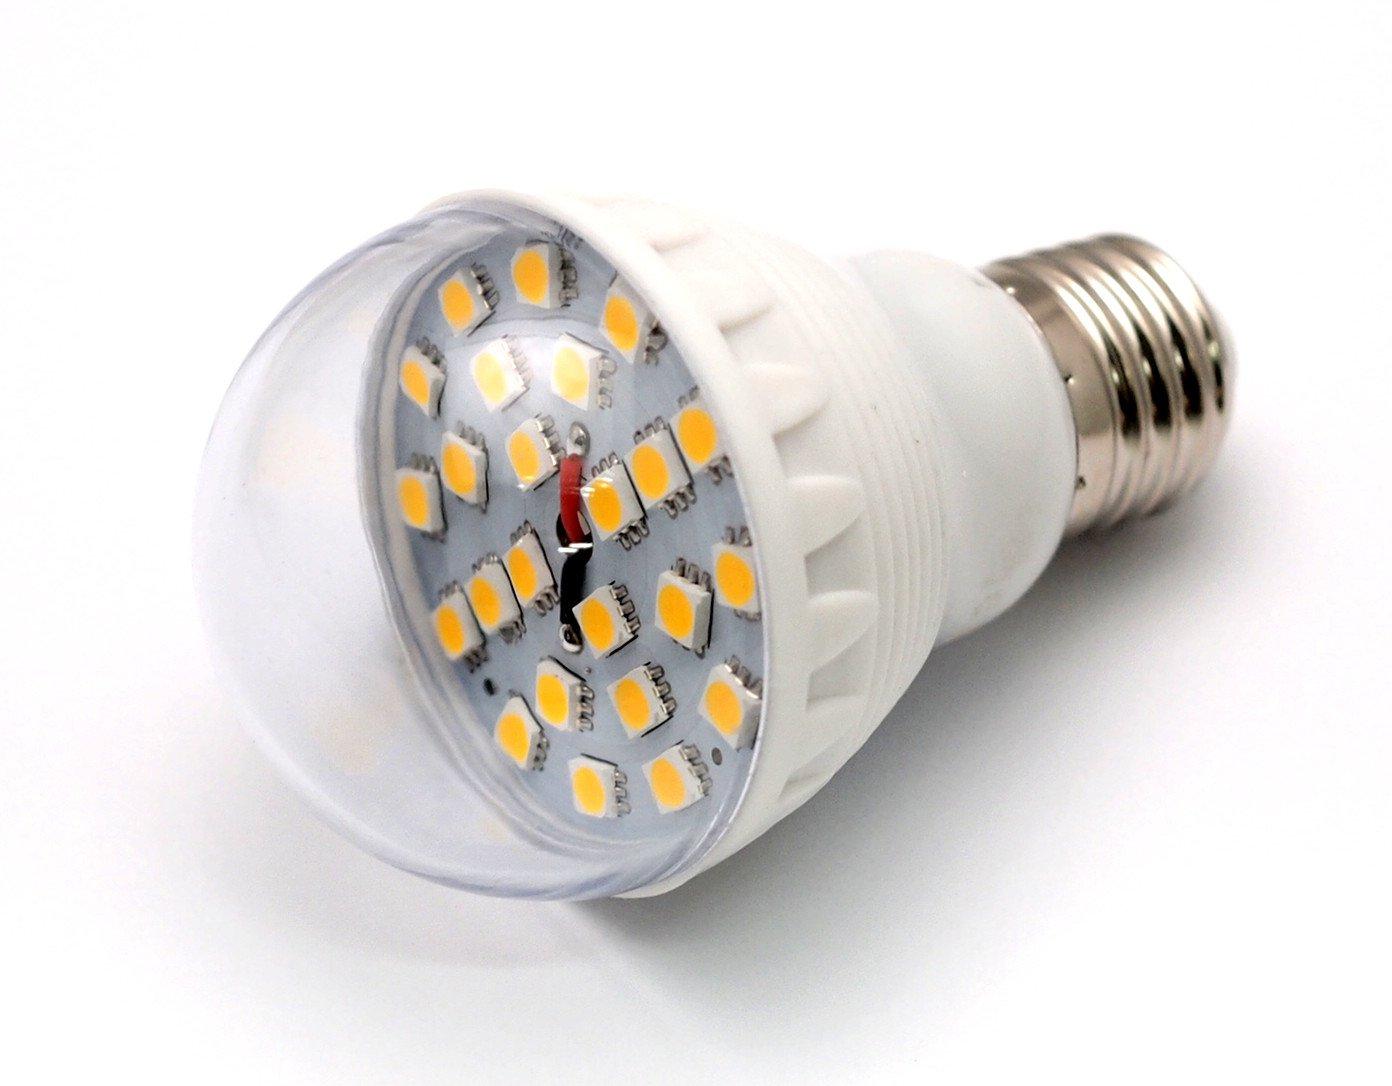 12 Volt LED Light Bulb DC 12V 3000K Warm White Parade Float Van RV ... for 12 Volt Led Lights For Homes  165jwn